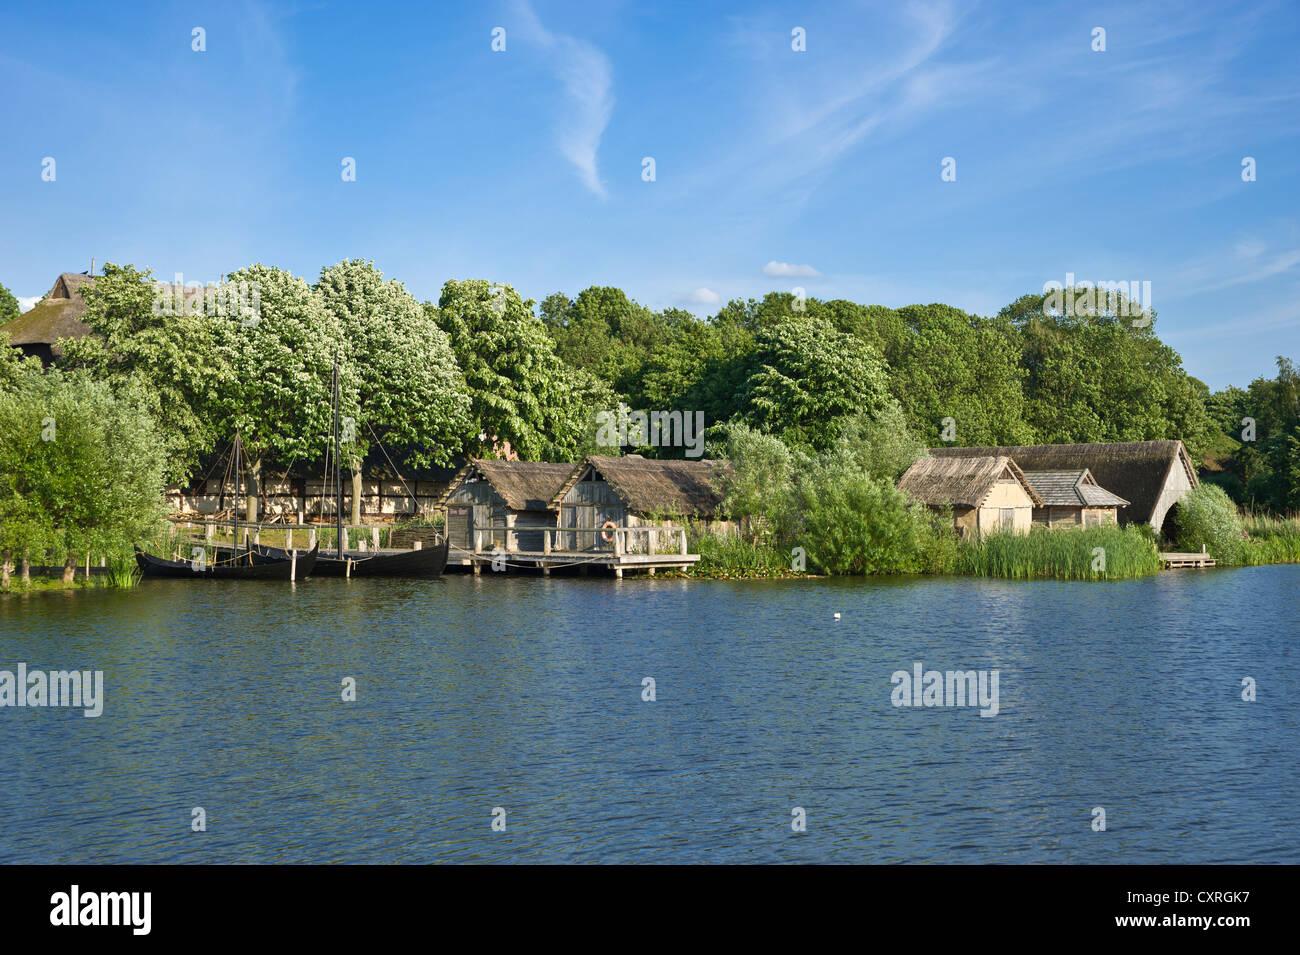 Wallmuseum, Slavic village and lake Wallsee, Oldenburg in Holstein, Baltic Sea, Schleswig-Holstein, Germany, Europe - Stock Image